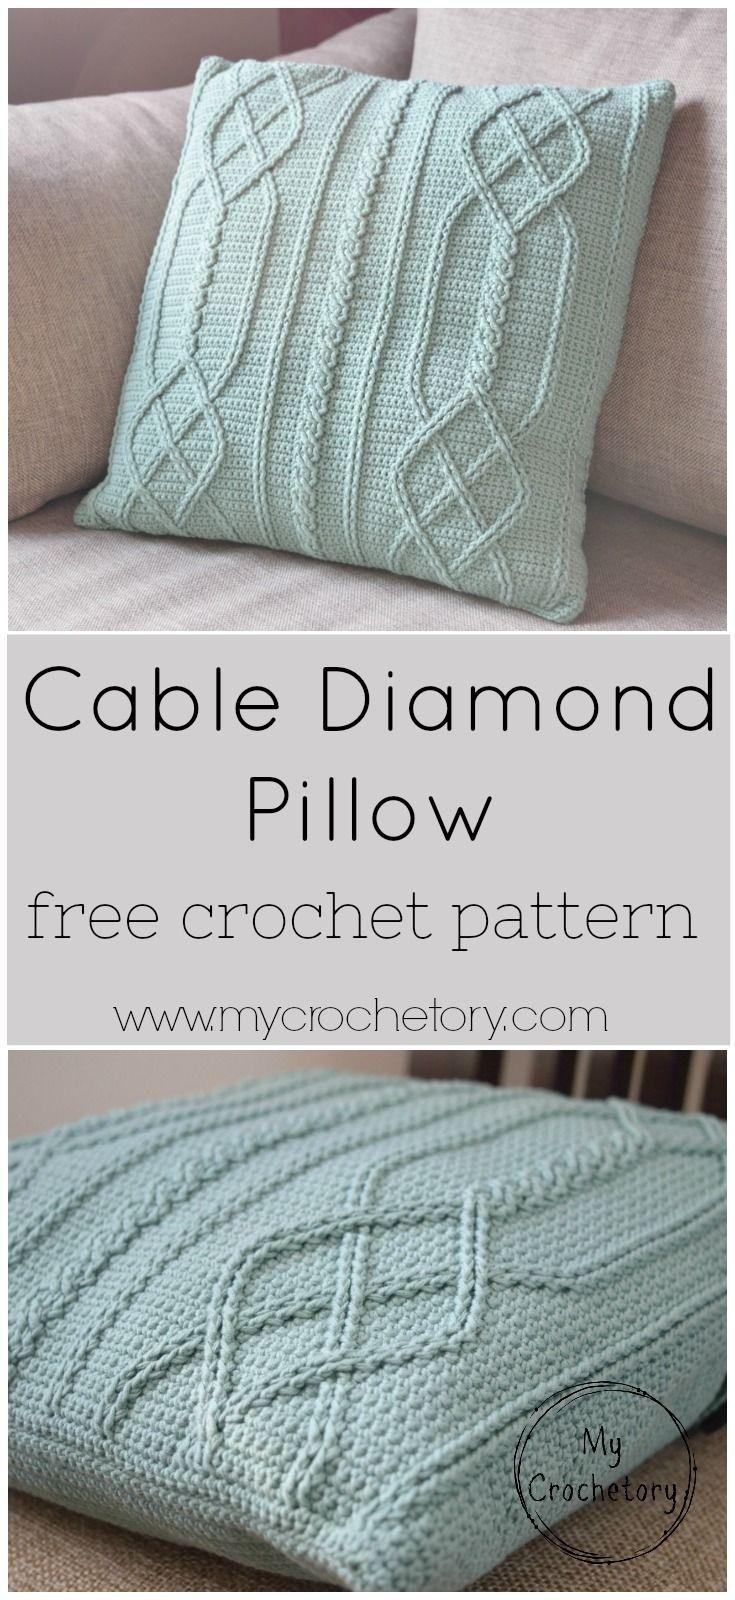 Cable Diamond Pillow - free crochet pattern by | Crochet Cocina ...